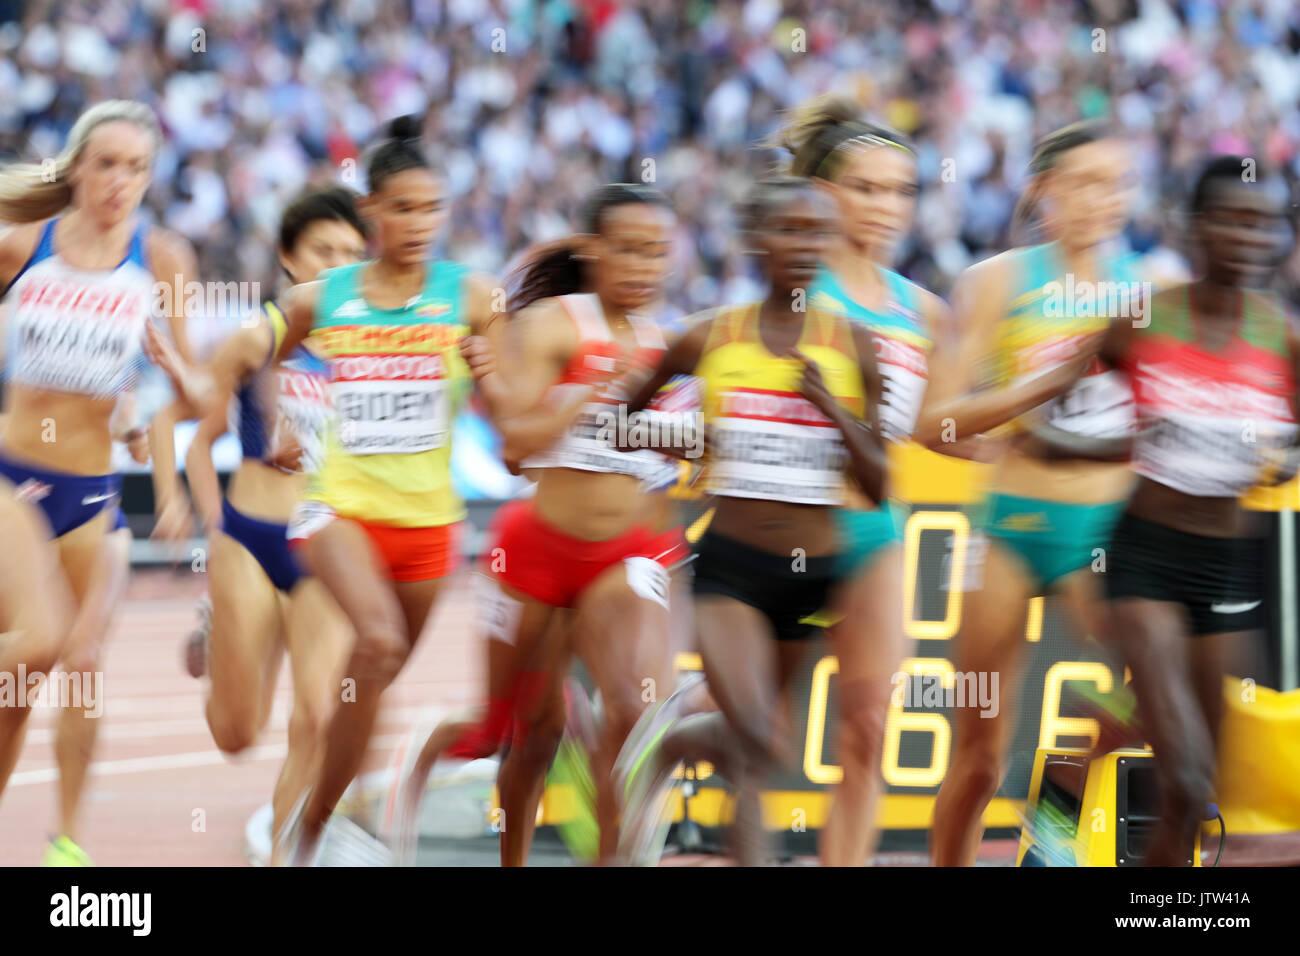 London, UK. 10th Aug, 2017. IAAF World Championships, Queen Elizabeth Olympic Park, Stratford, London, UK. Credit: Stock Photo